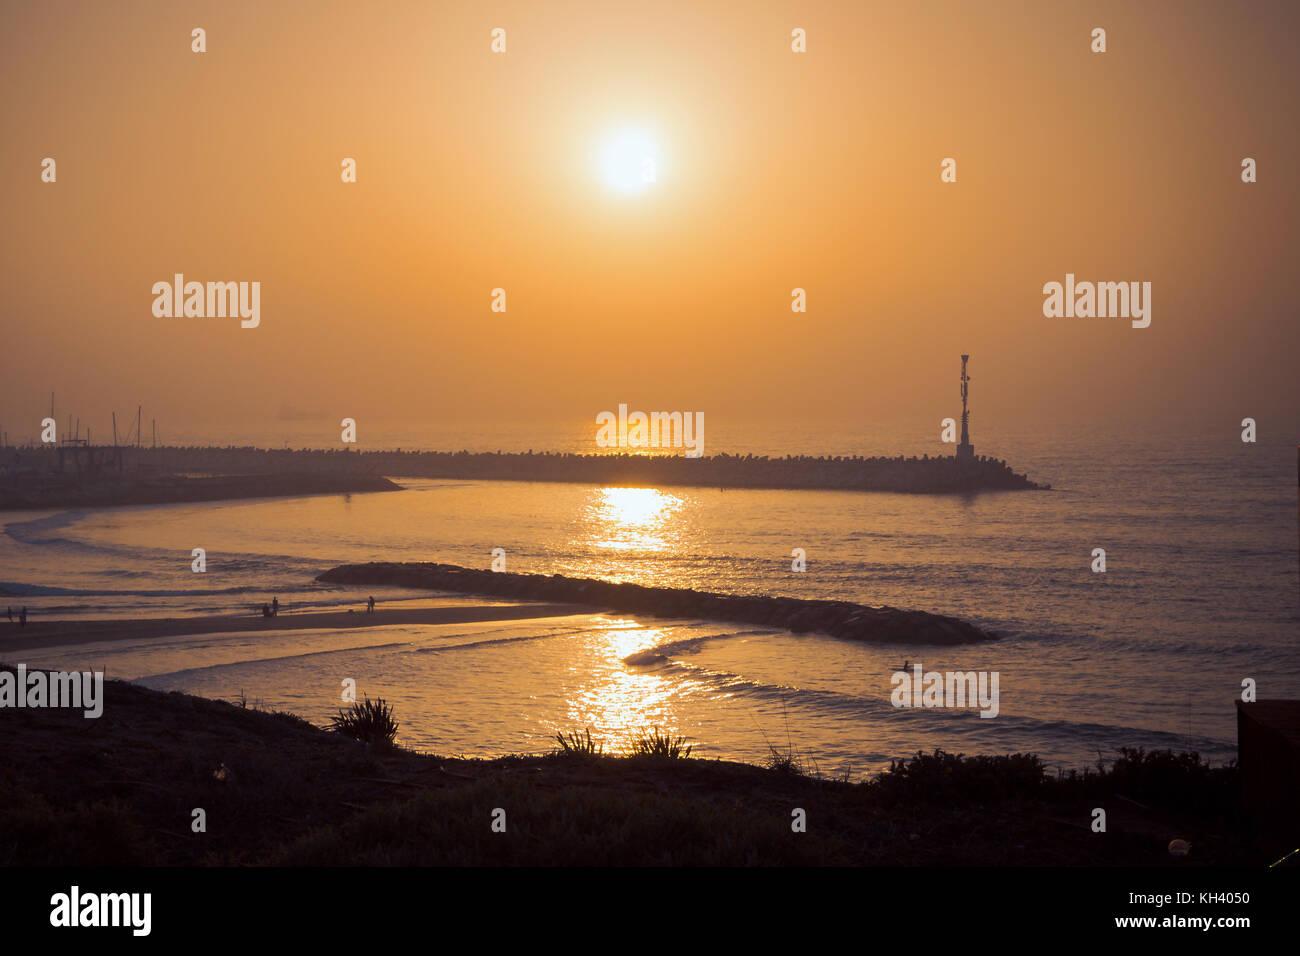 Lighthouse in Ashkelon. Evening shot - Stock Image